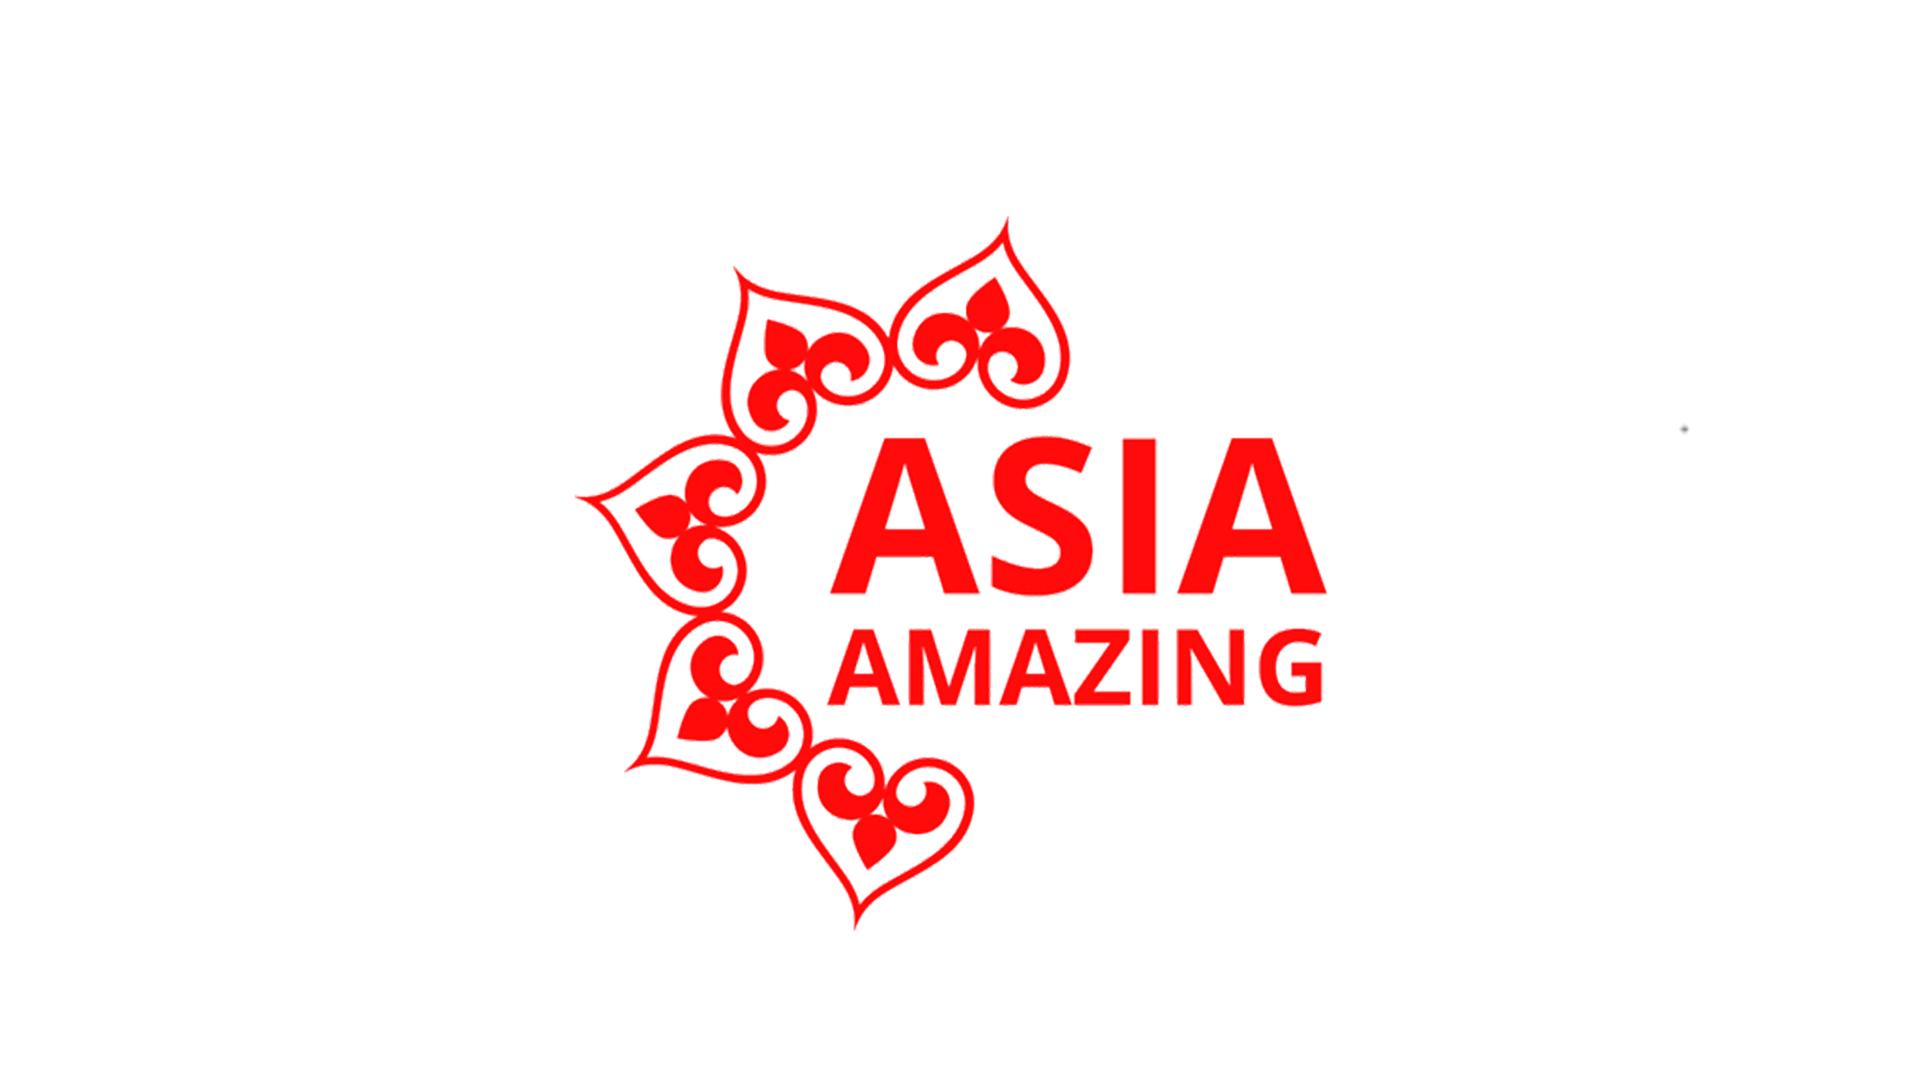 Asia Amazing